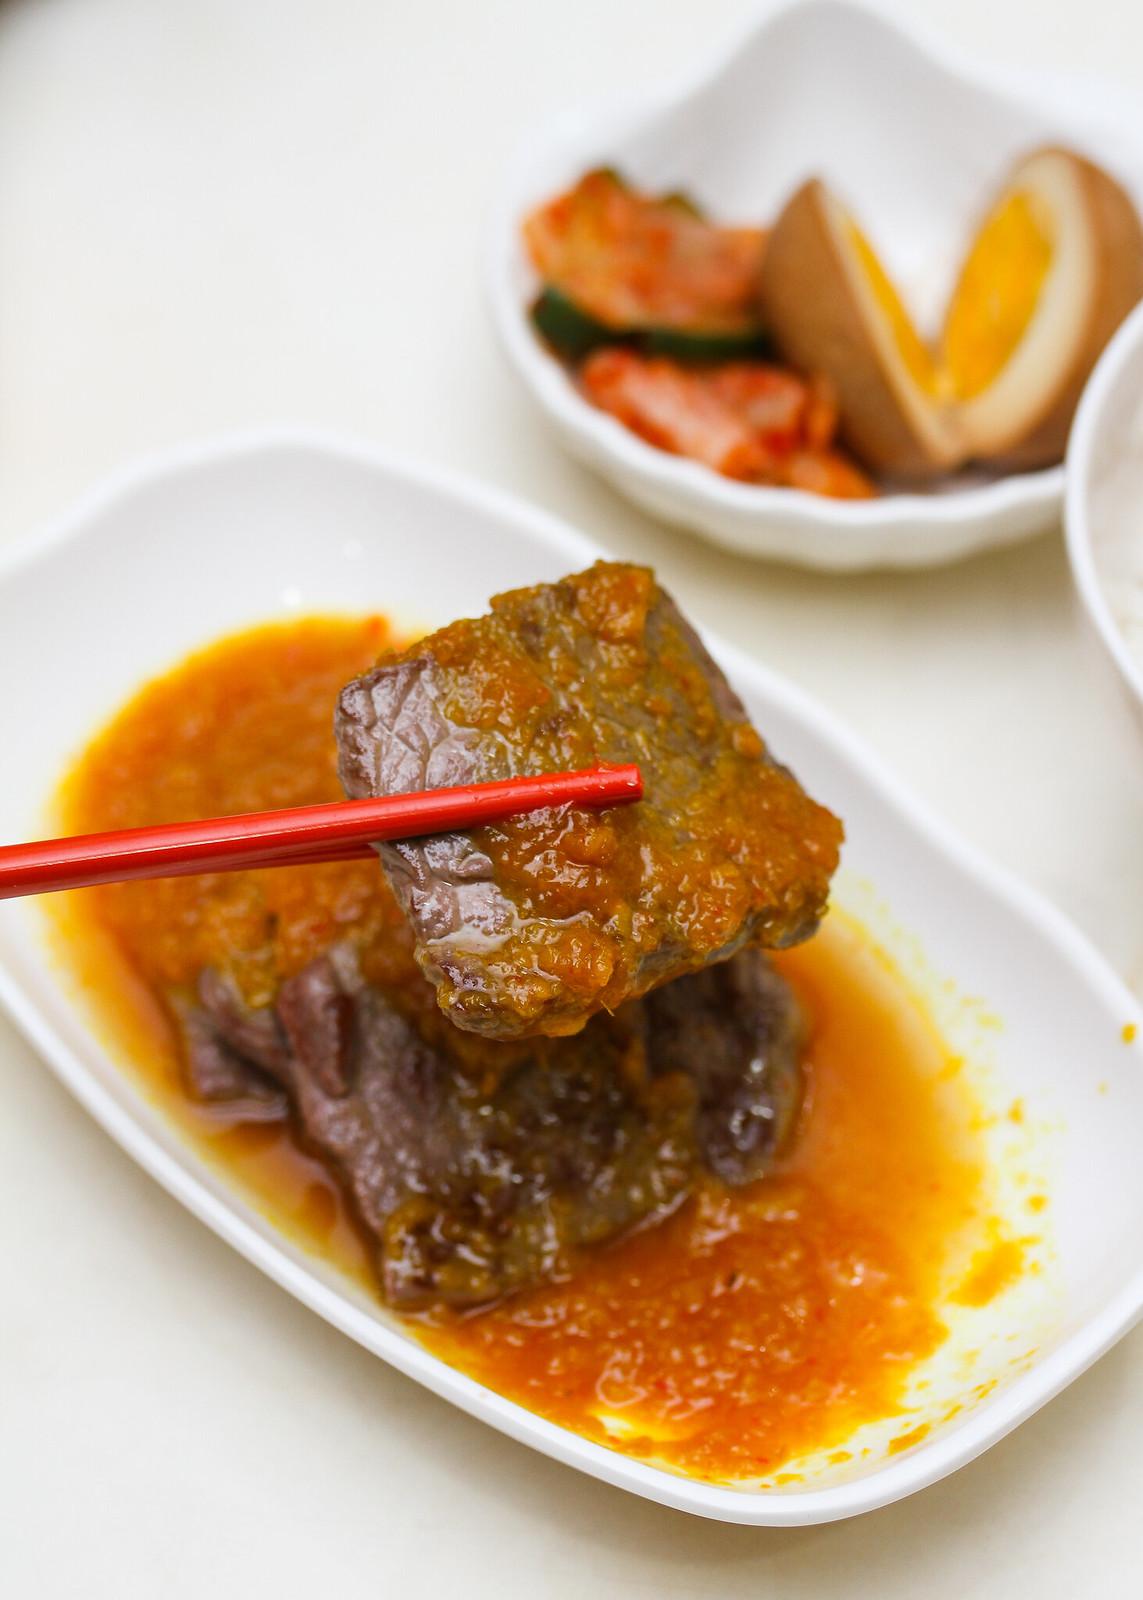 Taste of Taiwan - Sirloin OJ Pineapple